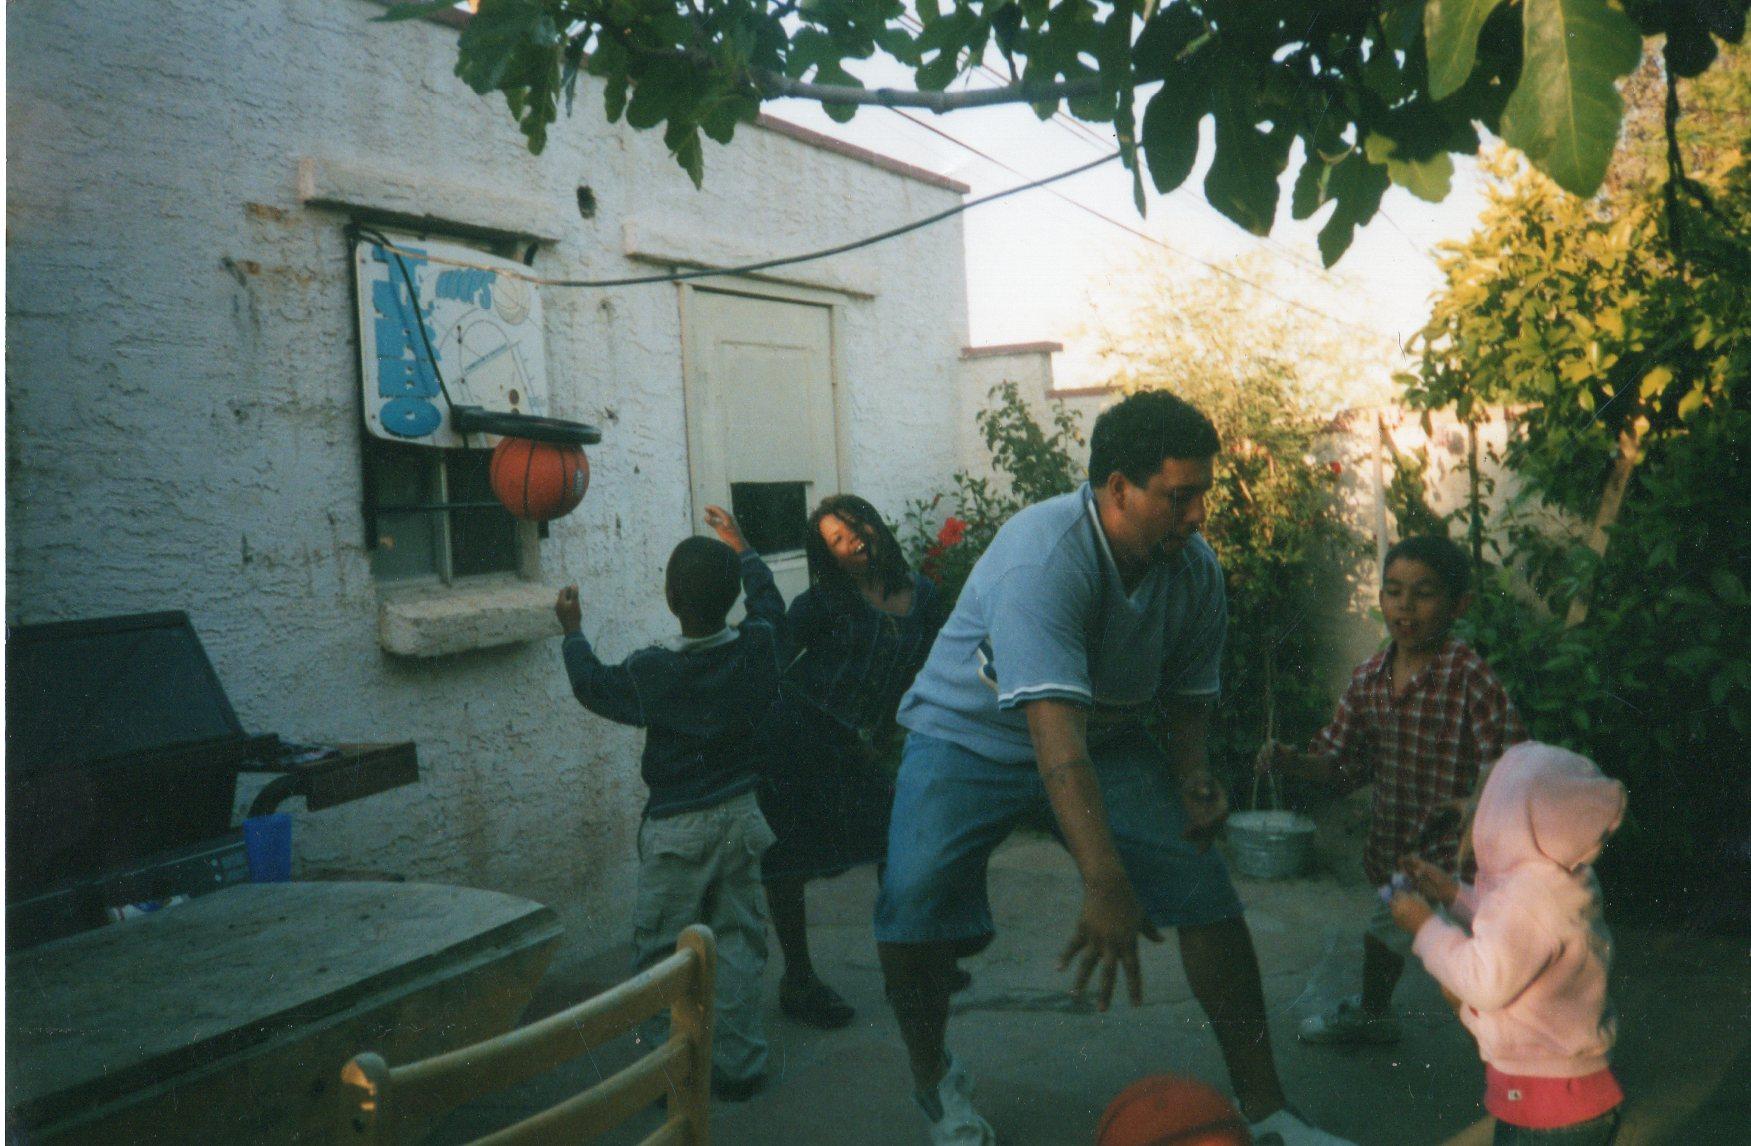 Caption: Tio Ray Plays With the Kids, Credit: Jacqui Zazueta